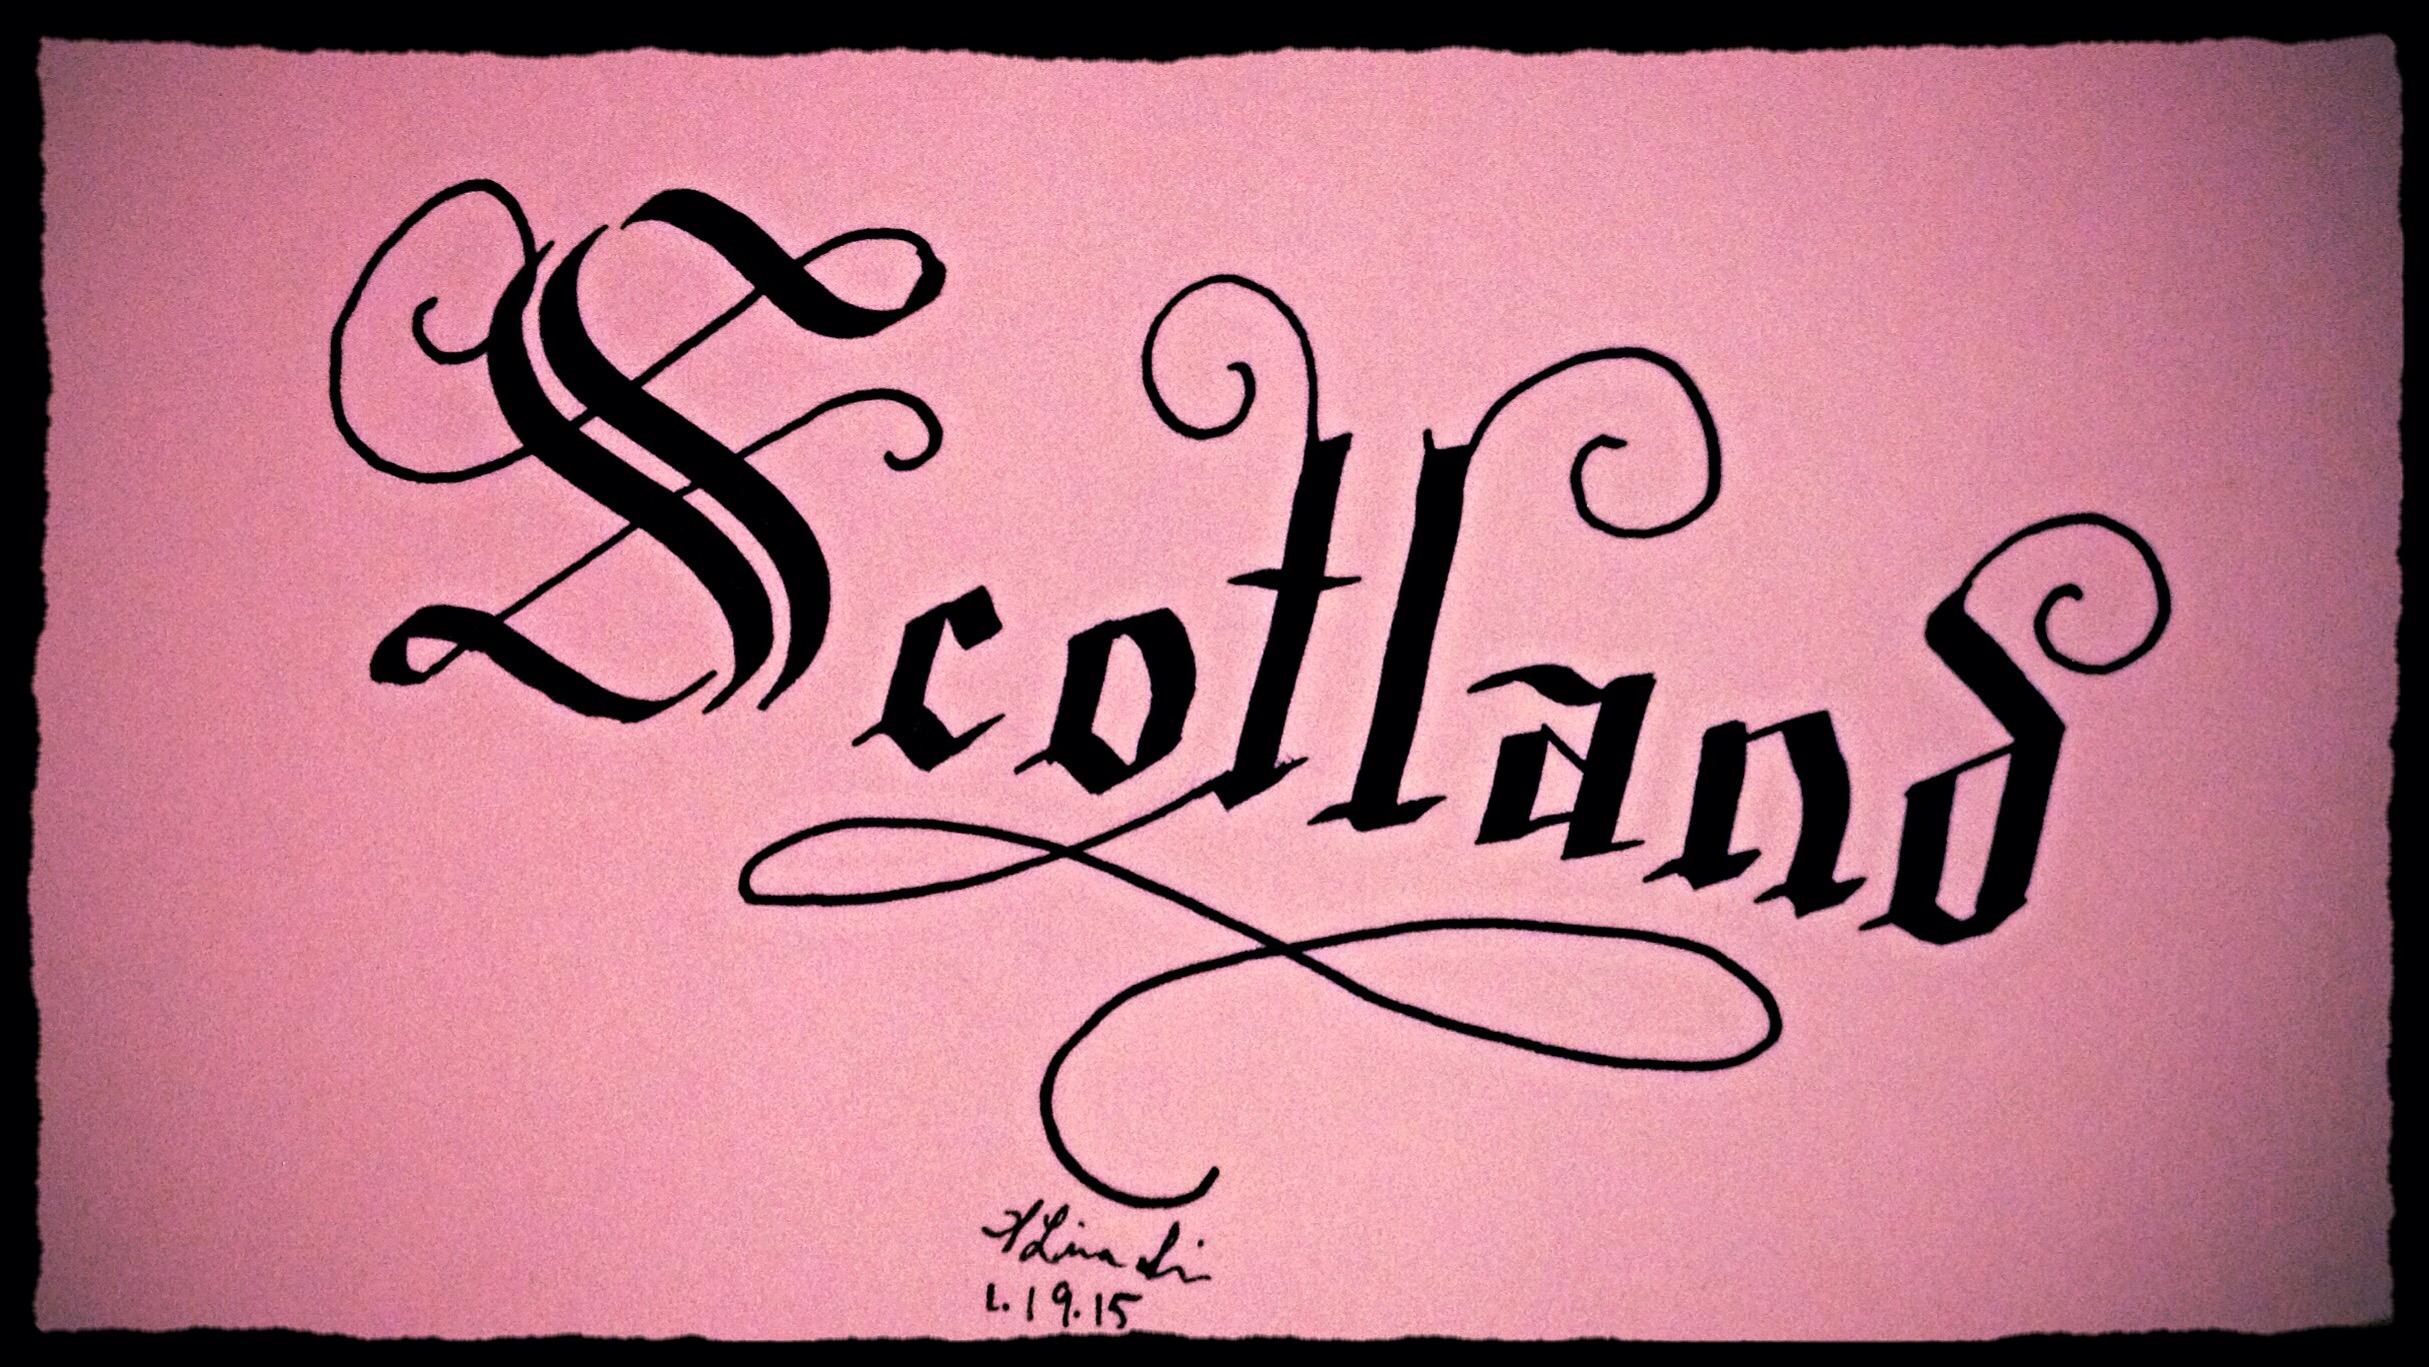 Scotland calligraphy writing